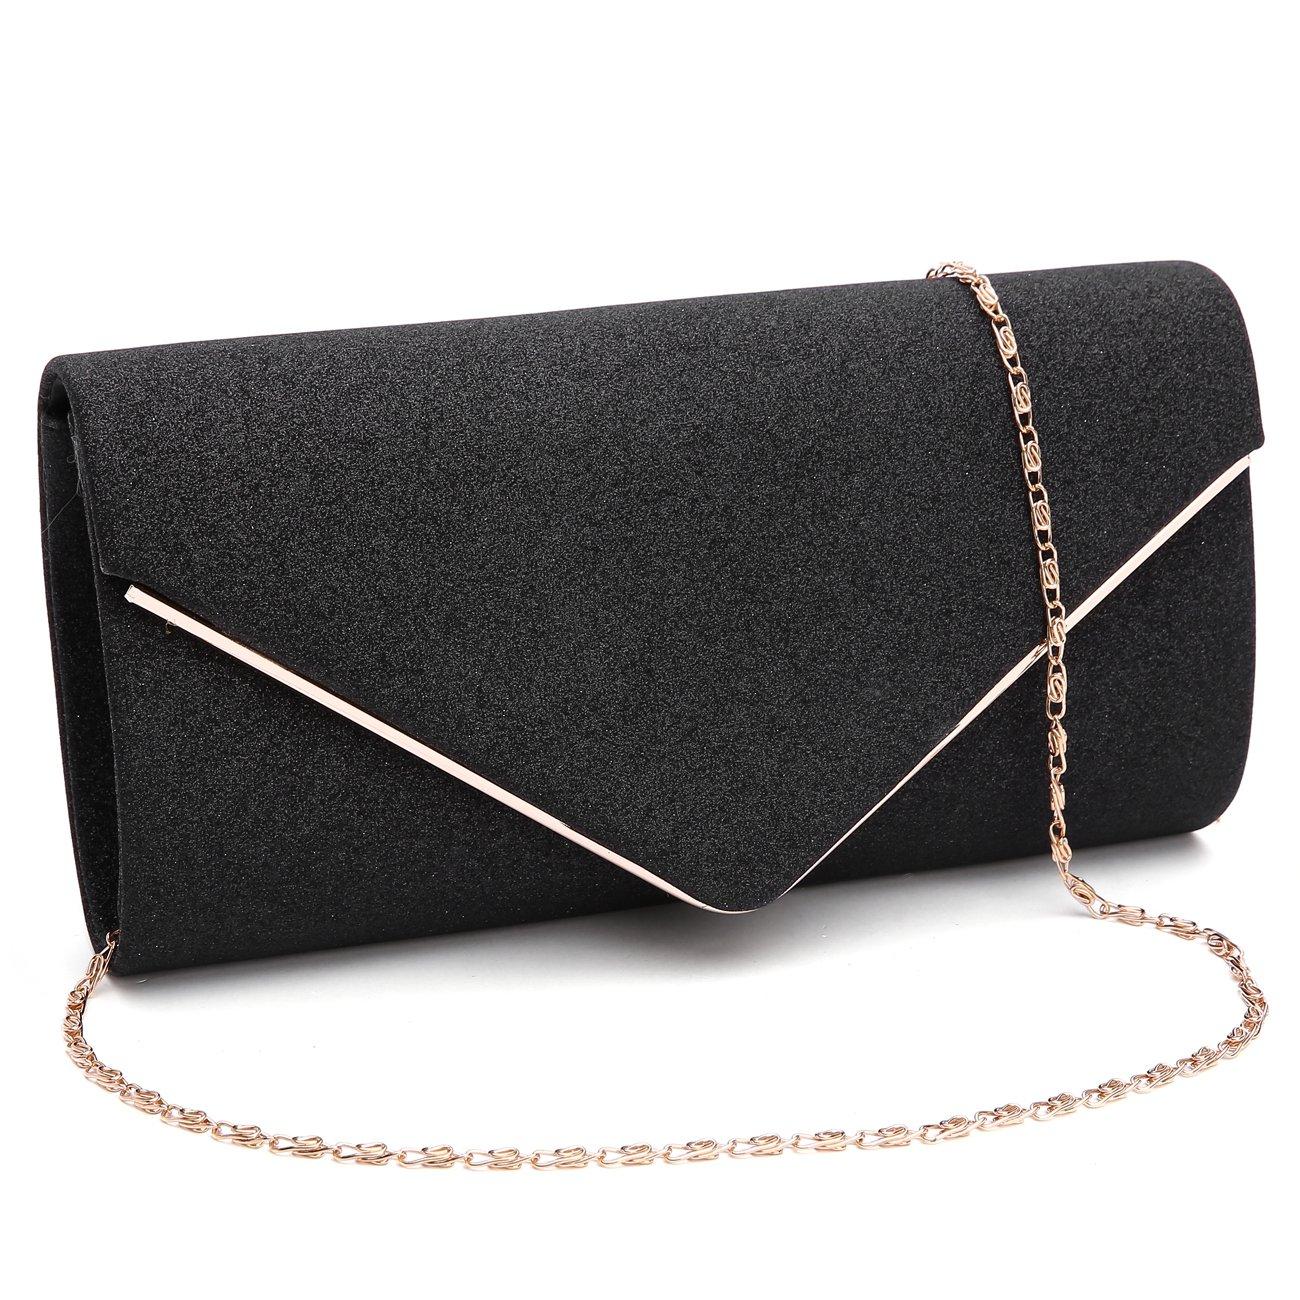 86e9ca4398bb Gesu womens shining envelope clutch purses glitter evening bag handbags for  wedding and party black handbags